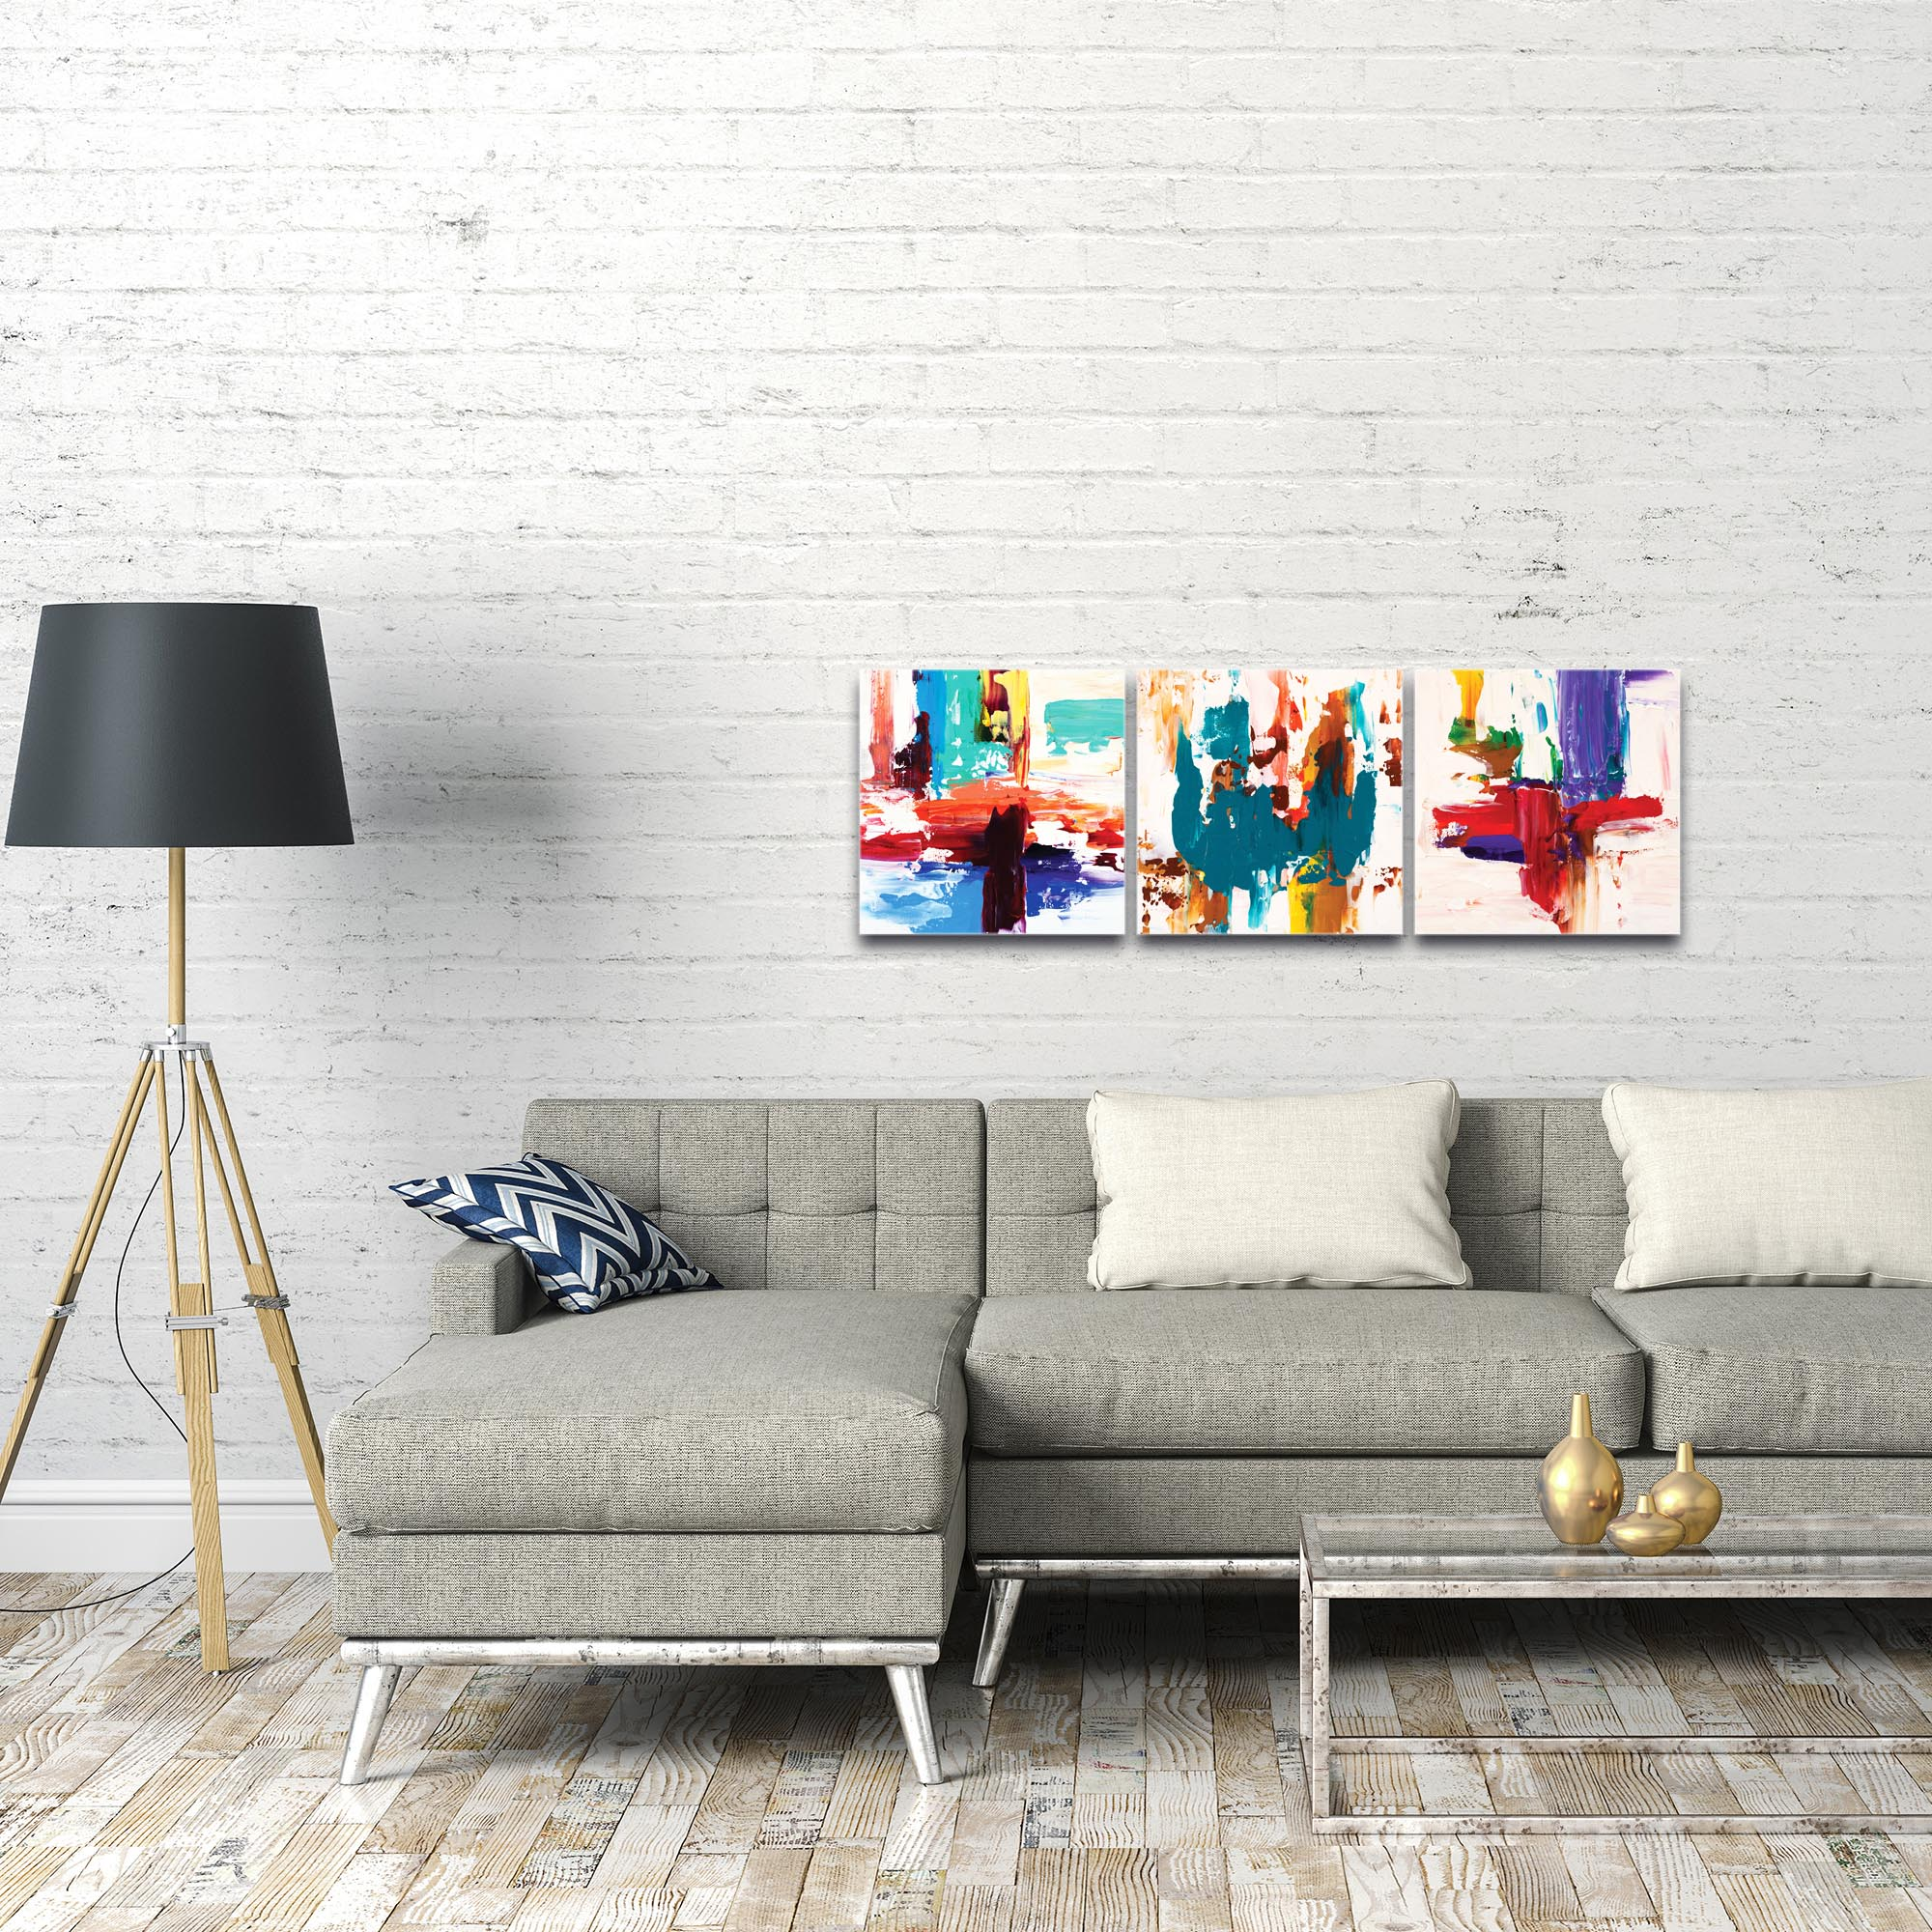 Abstract Wall Art 'Urban Triptych 2' - Urban Decor on Metal or Plexiglass - Image 3